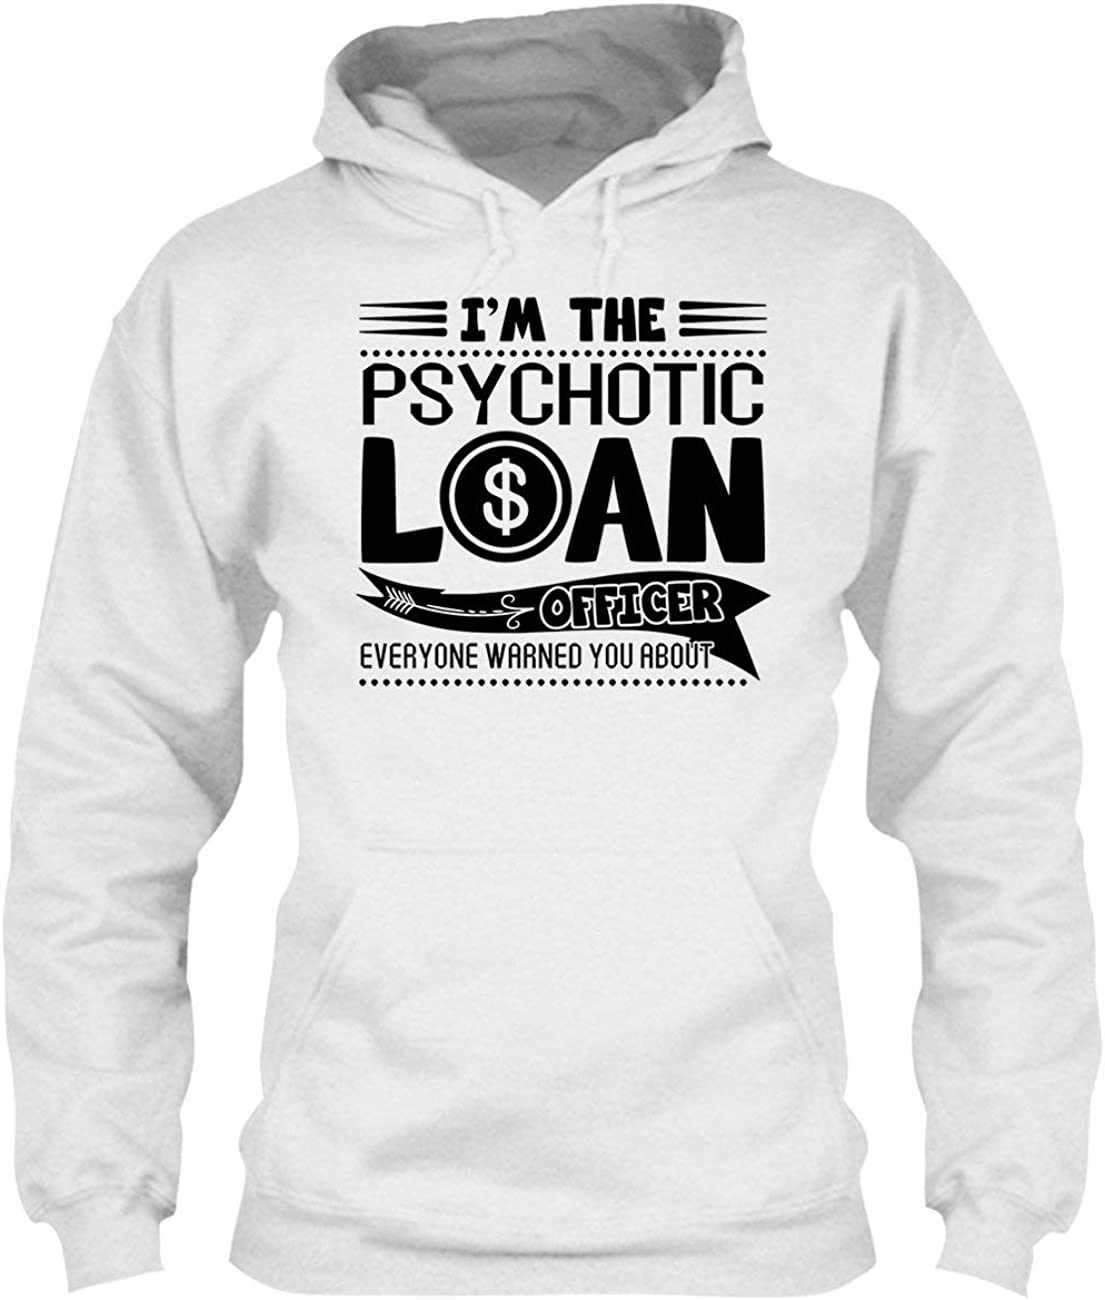 Clothing Tee Shirt Light Orange Psychotic Loan Officer Shirt